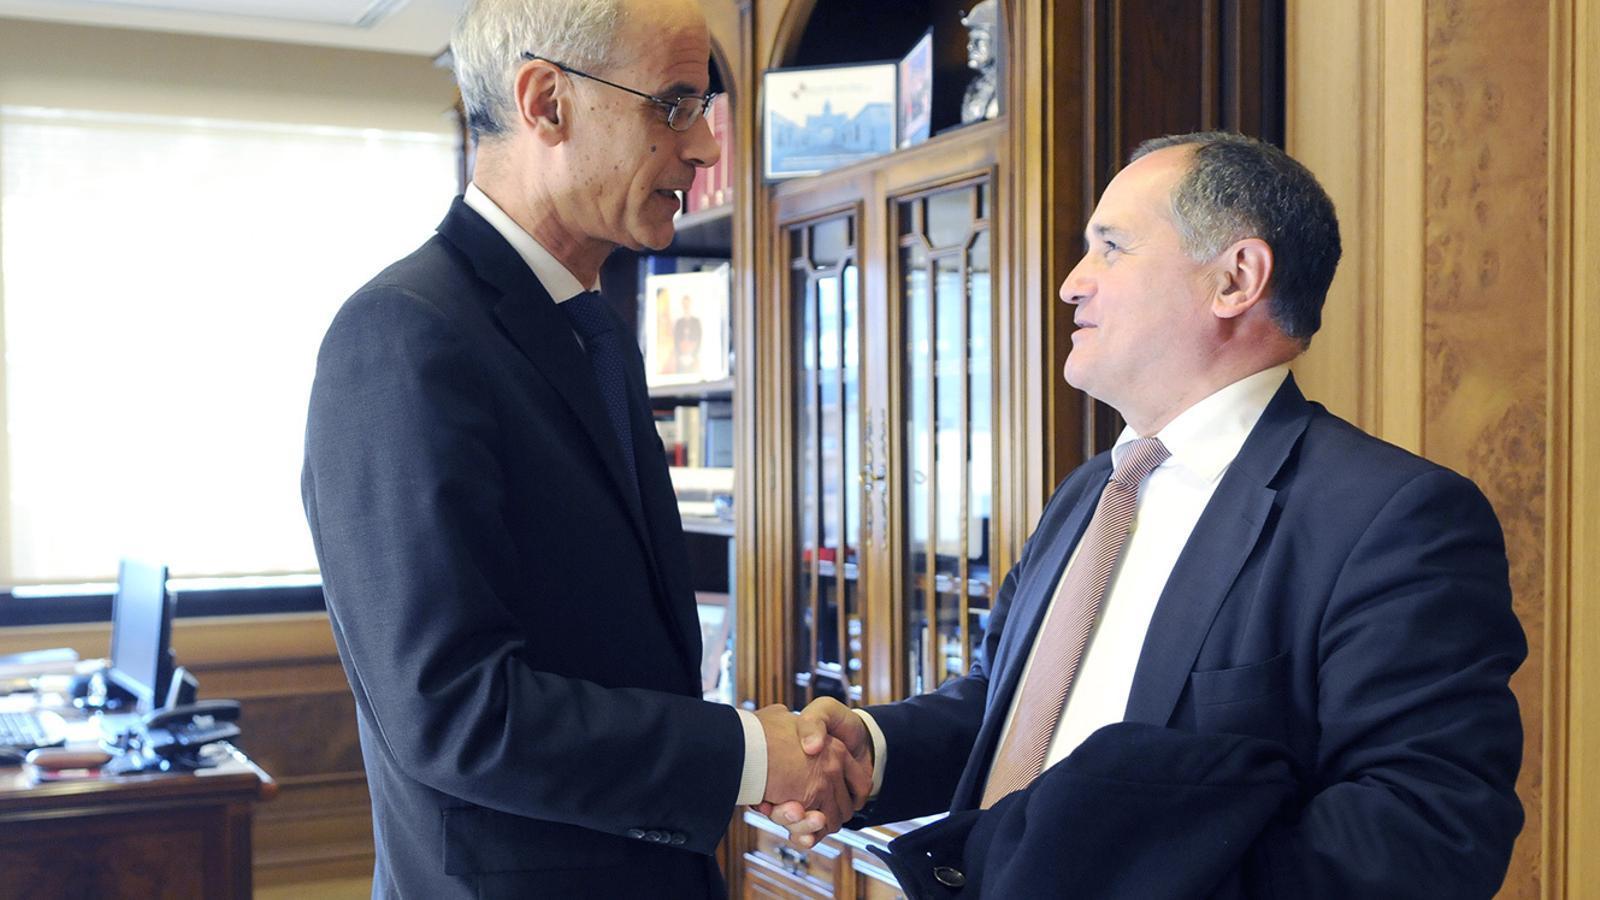 El cap de Govern Toni Martí saluda al diputat portuguès Paulo Pisco. / SFG